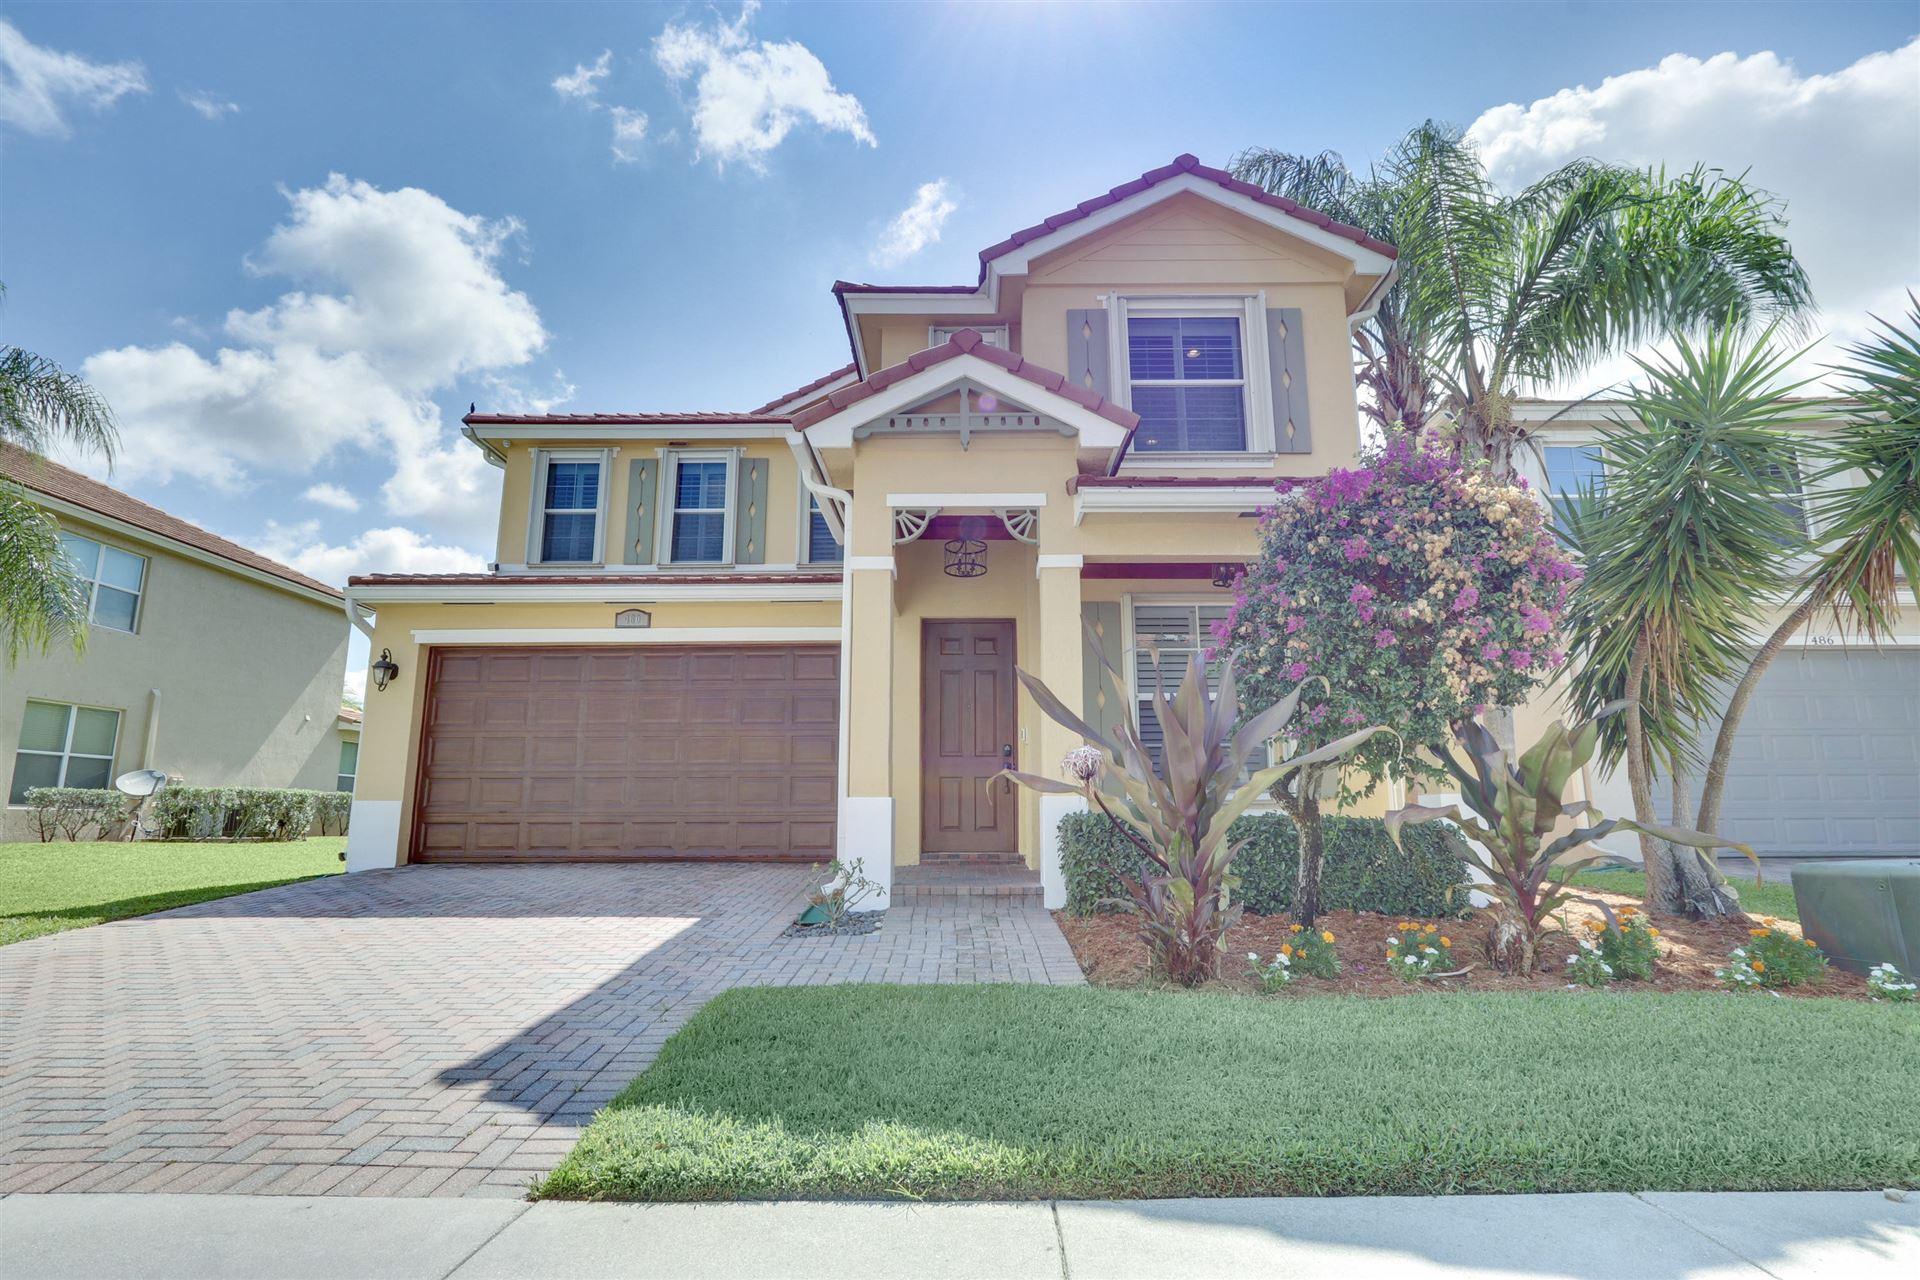 480 Mulberry Grove Road, Royal Palm Beach, FL 33411 - #: RX-10715302